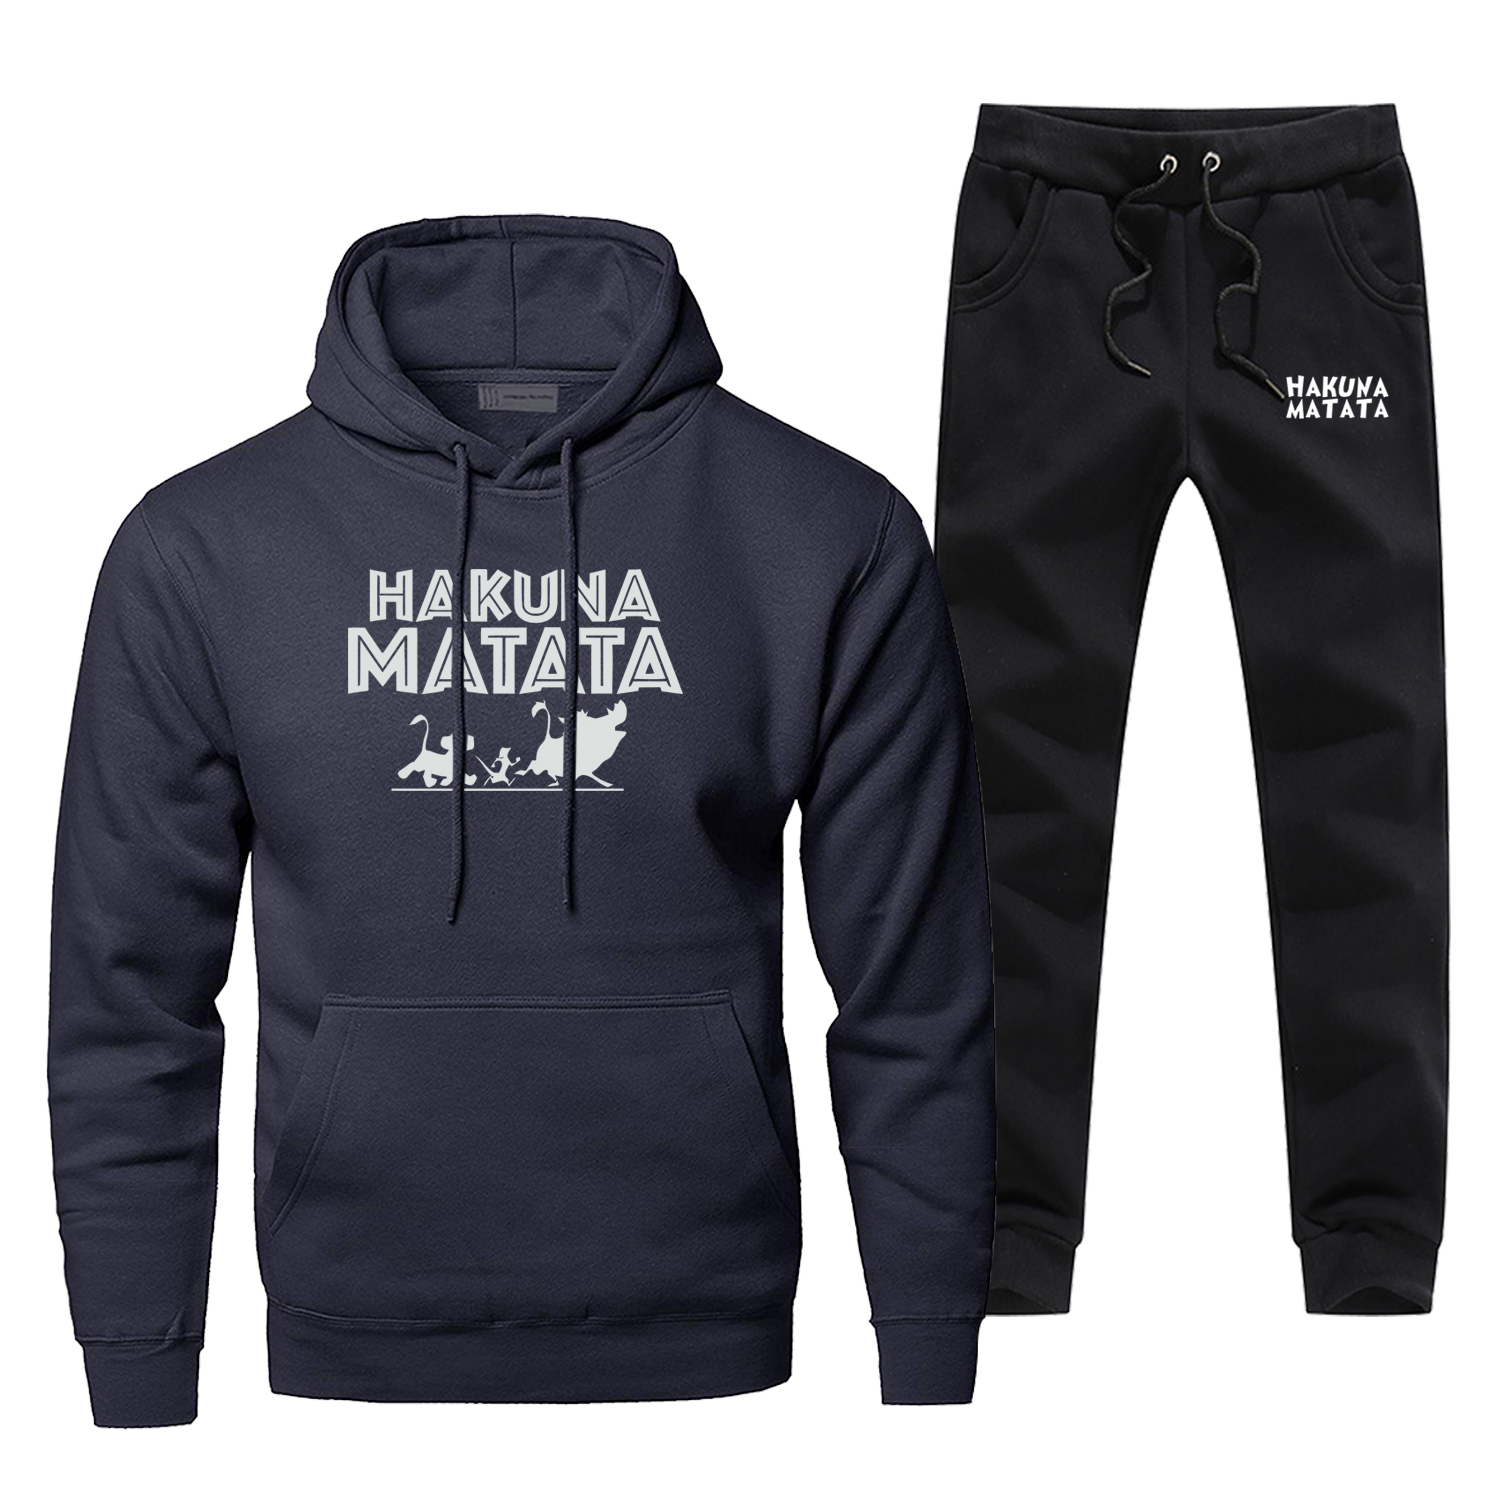 Fashion Lion King Hakuna Matata Sweatshirt Hoodies Pants Sets Men Casual Sportswear Mens Winter Harajuku Streetwear Sportswear